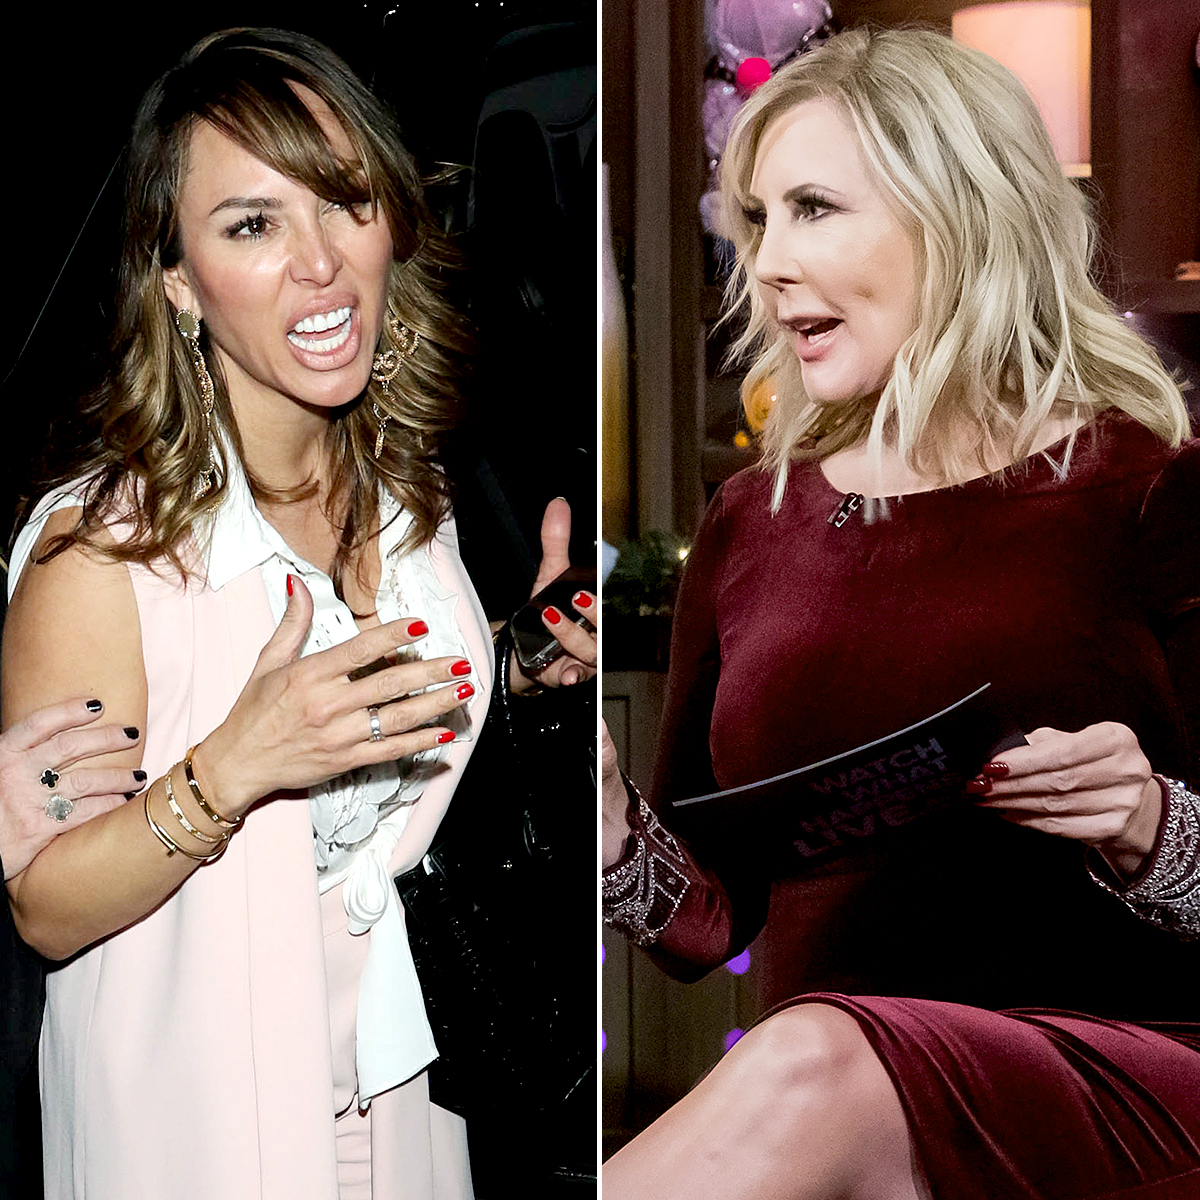 Kelly-Dodd-Wants-to-Hit-Vicky-Gunvalson - Kelly Dodd and Vicki Gunvalson